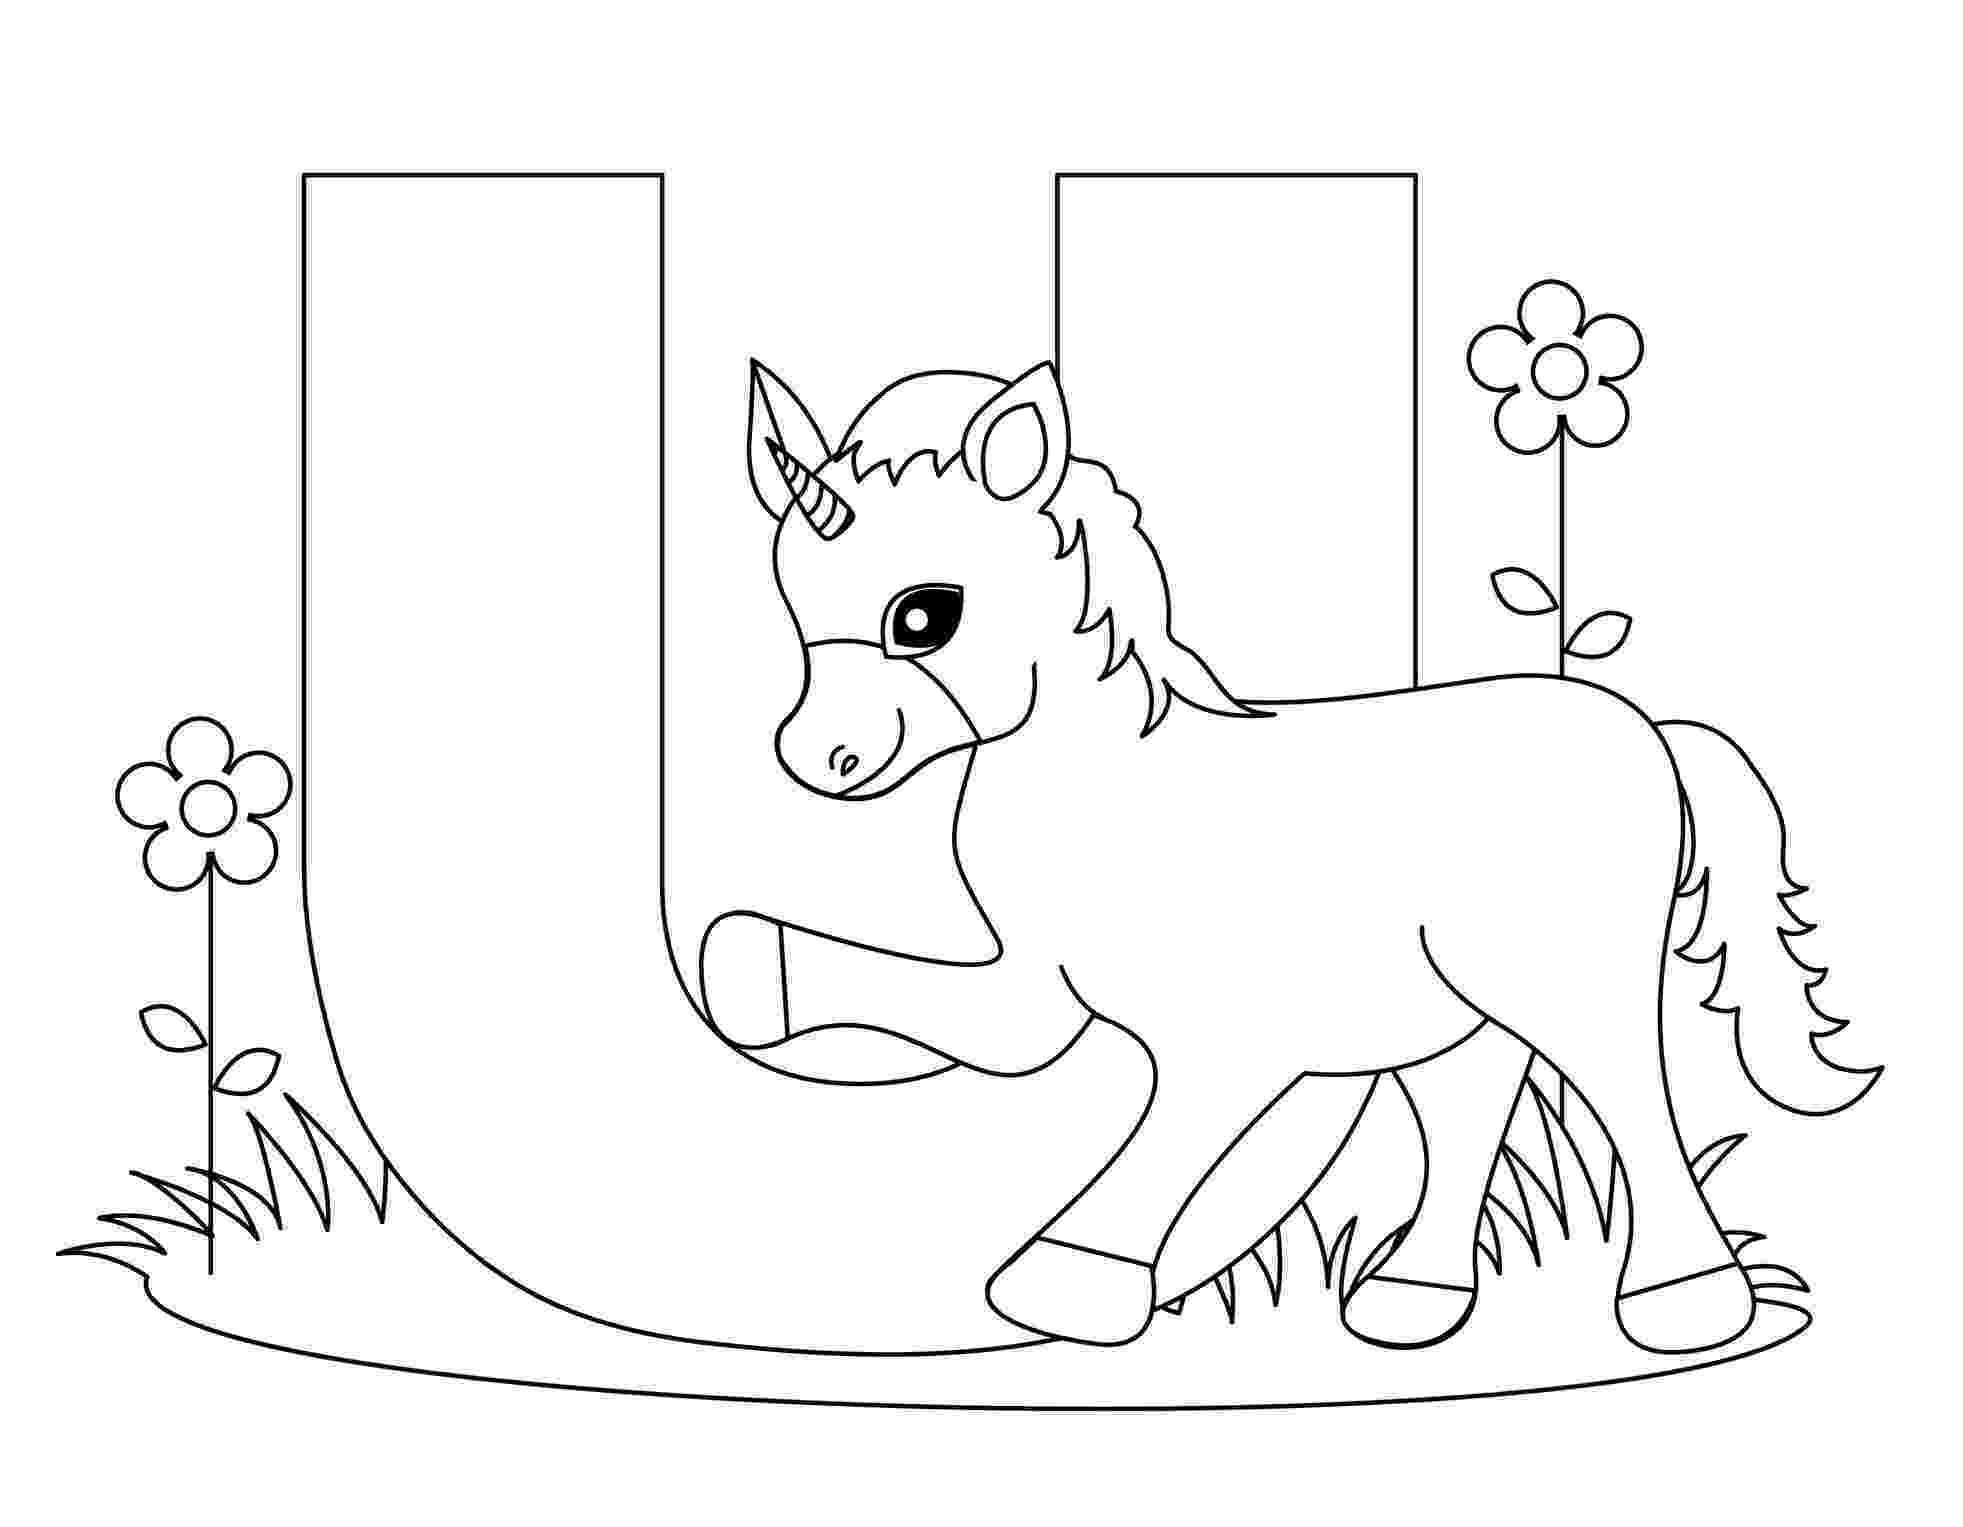 coloring animal alphabet alphabet printable coloring pages made with happy coloring animal alphabet